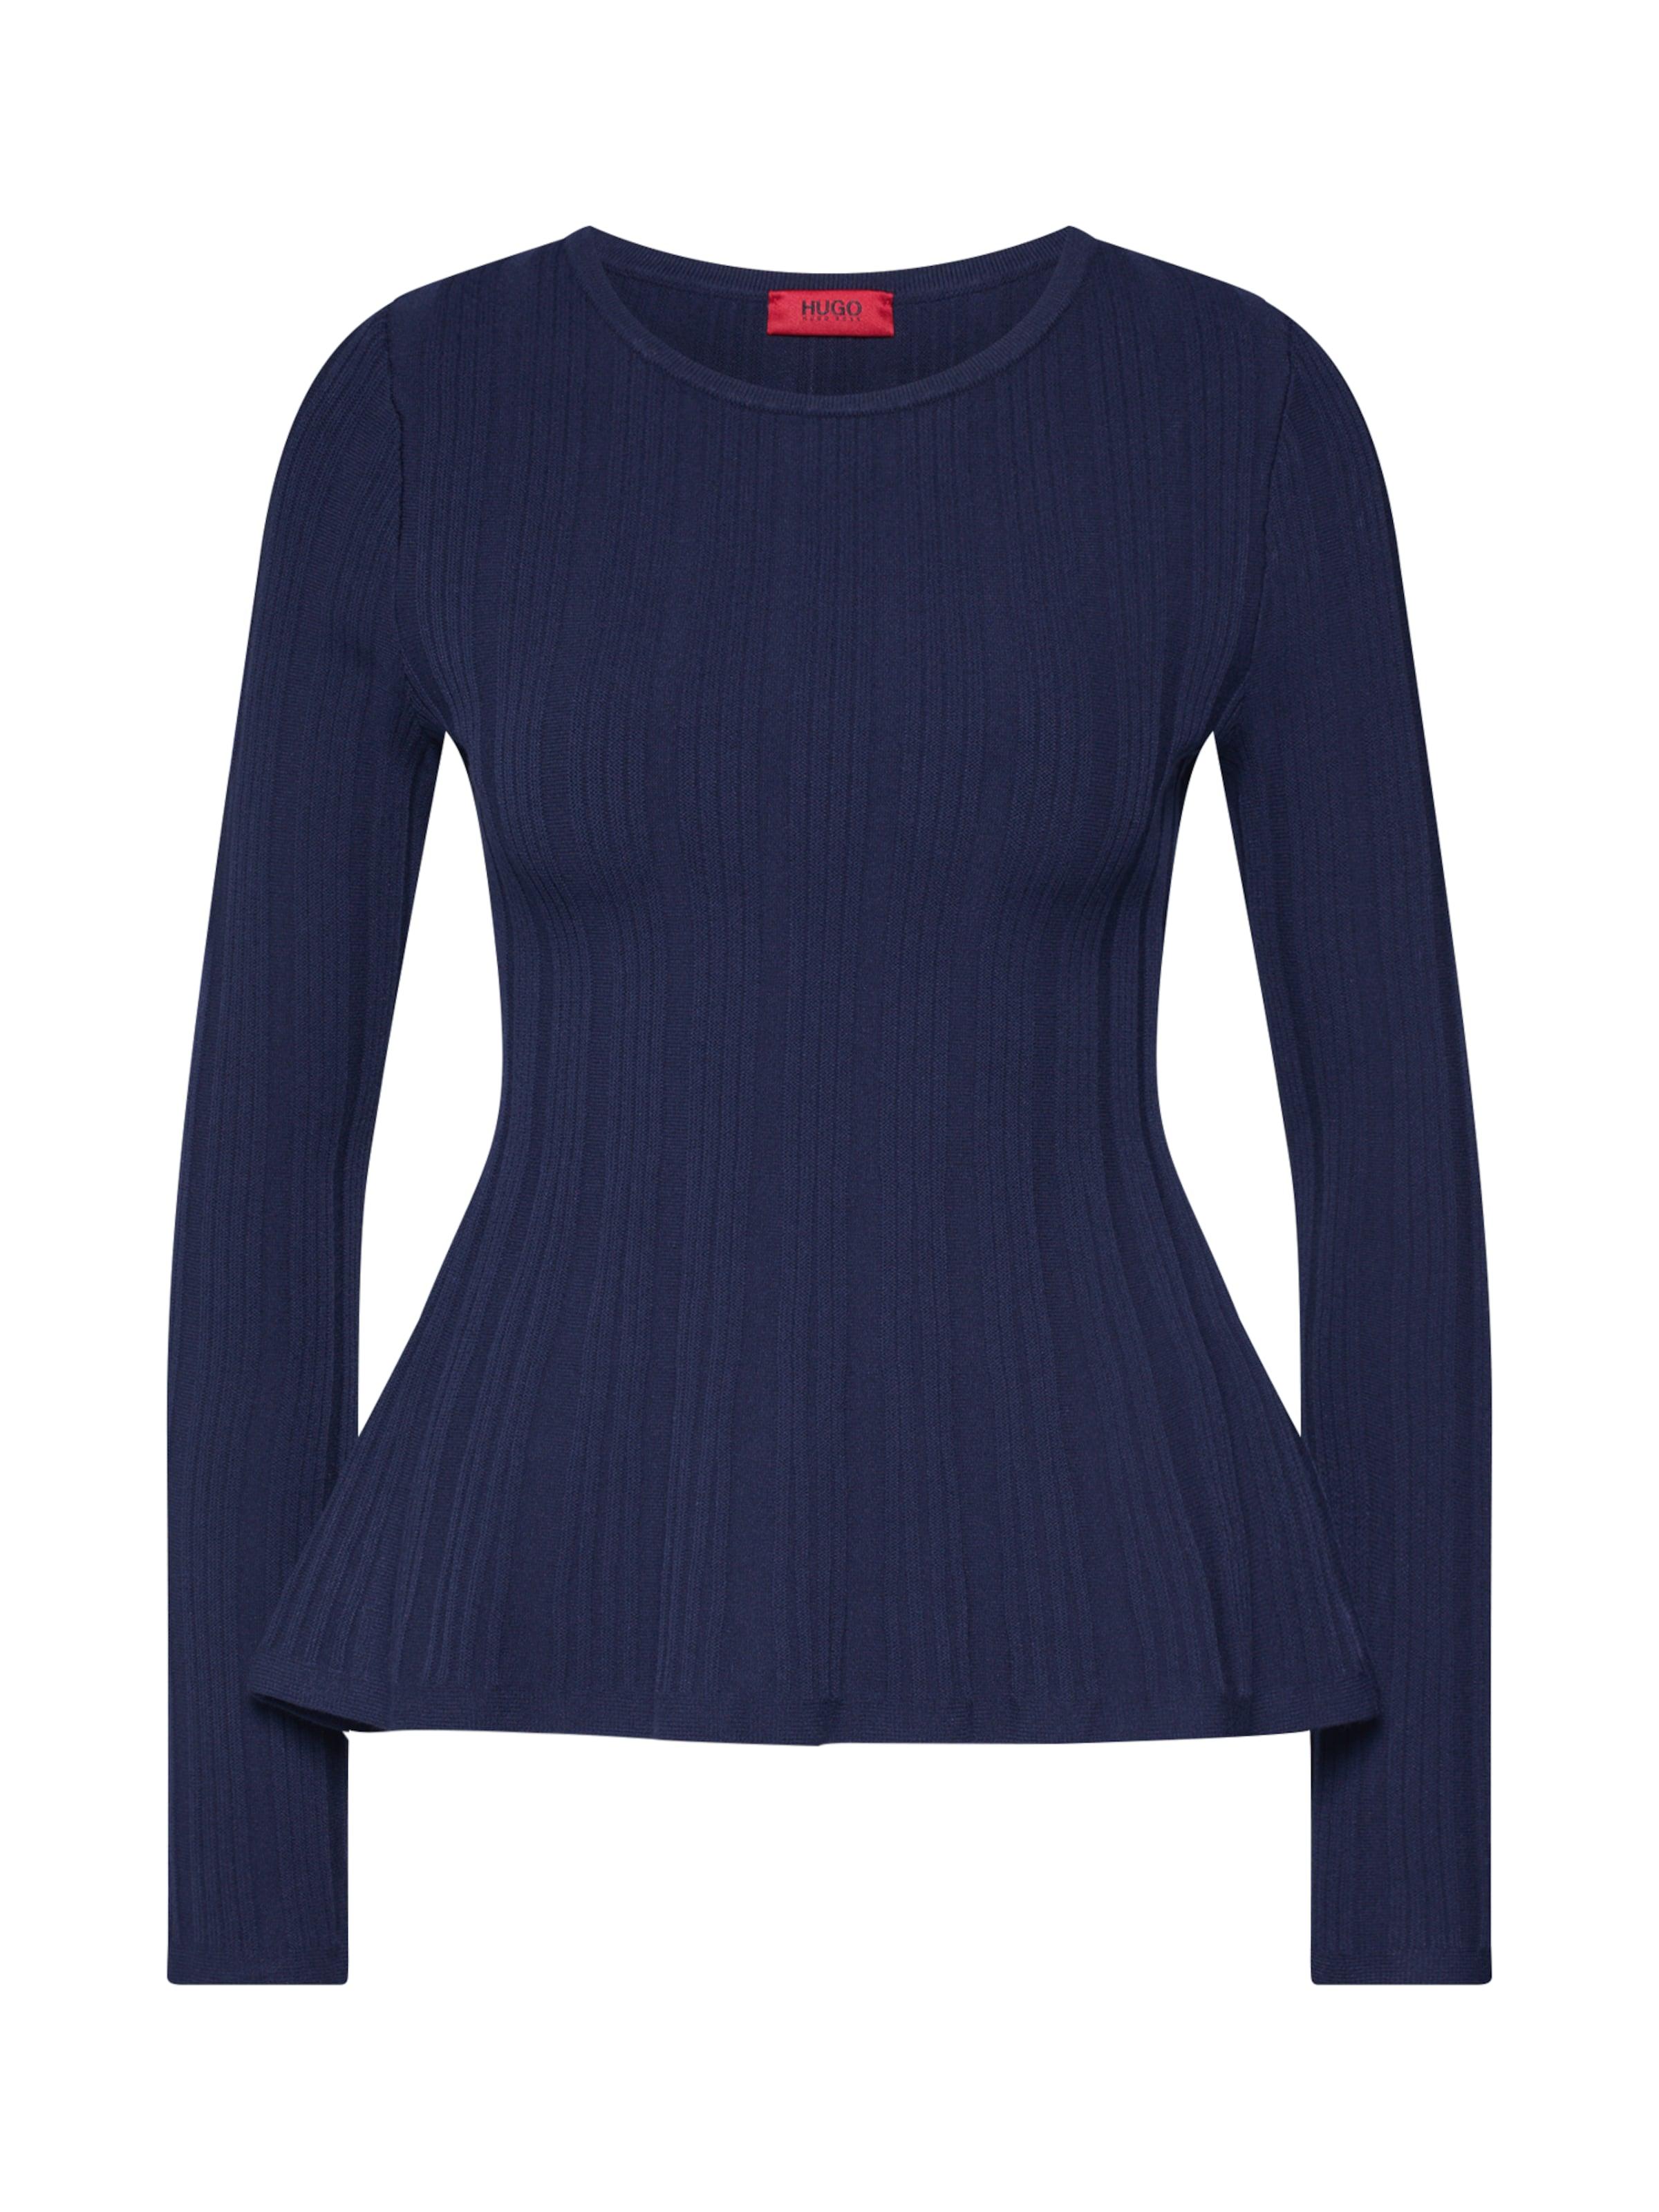 Pullover Blau Hugo 'sierita' 'sierita' Hugo In Pullover 3qcR45jLSA